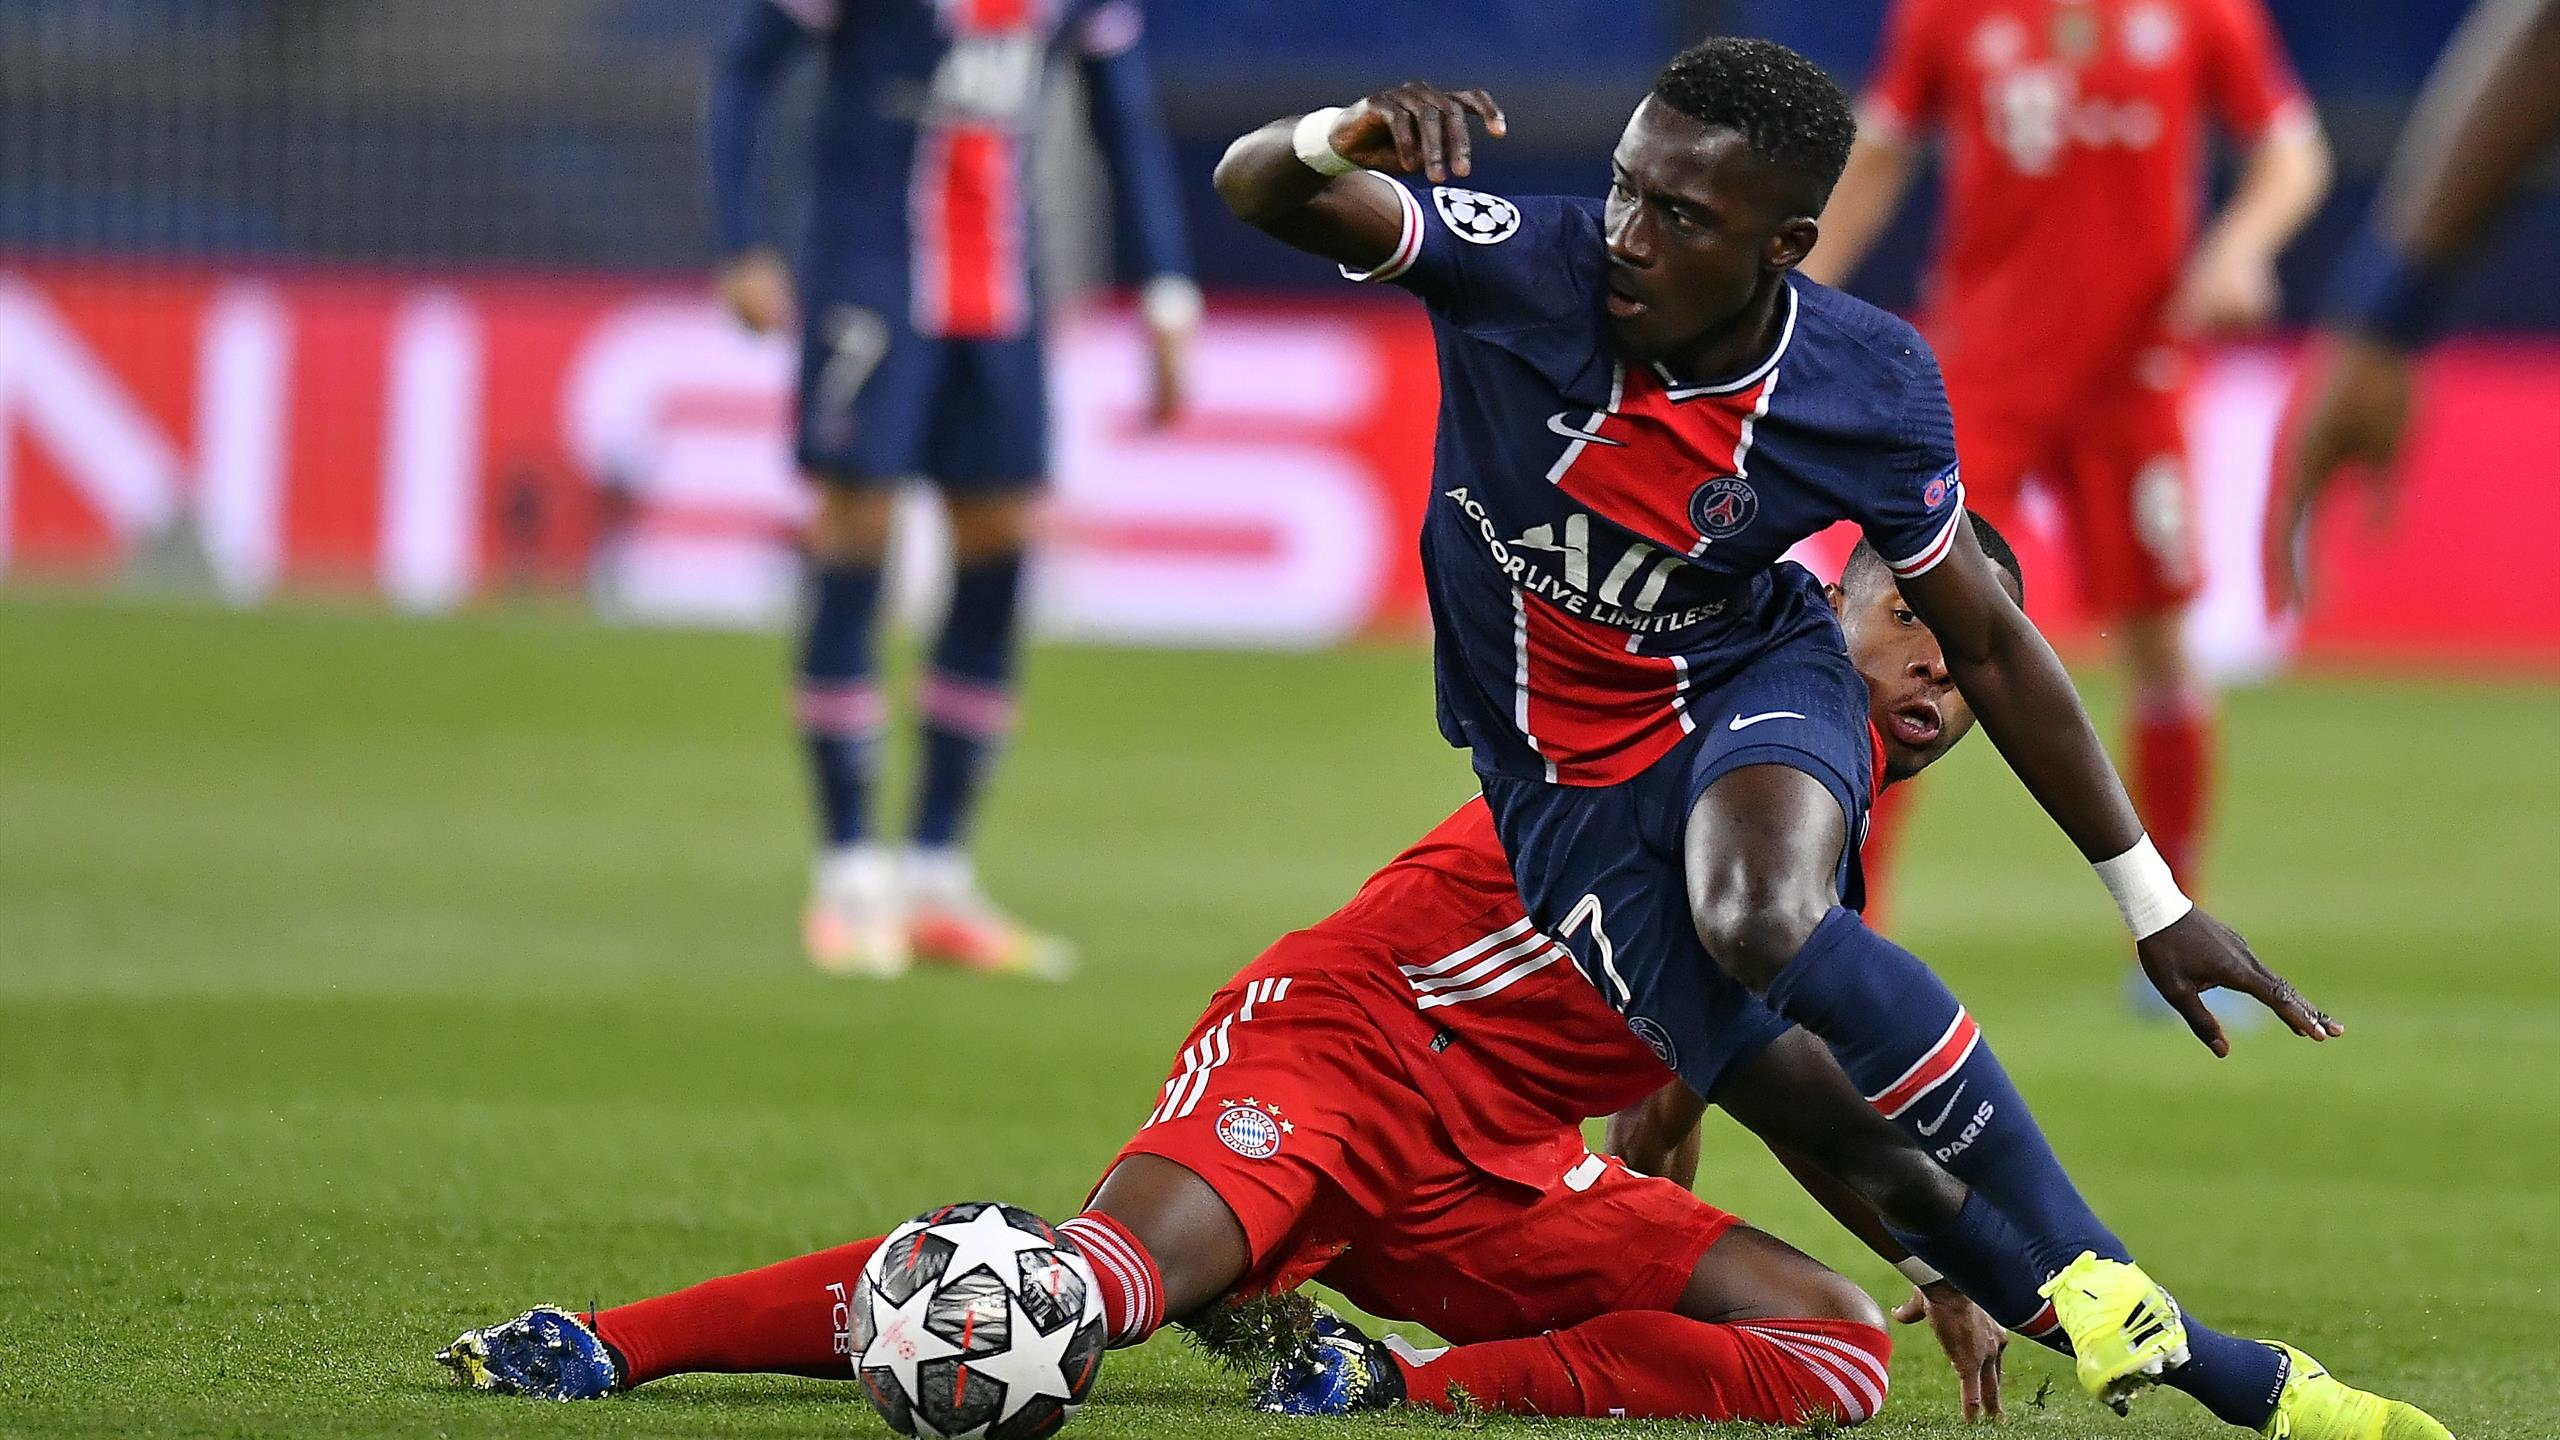 PSG – Il y avait eu le Real, il y aura le Bayern: Idrissa Gueye, «la machine» est relancée